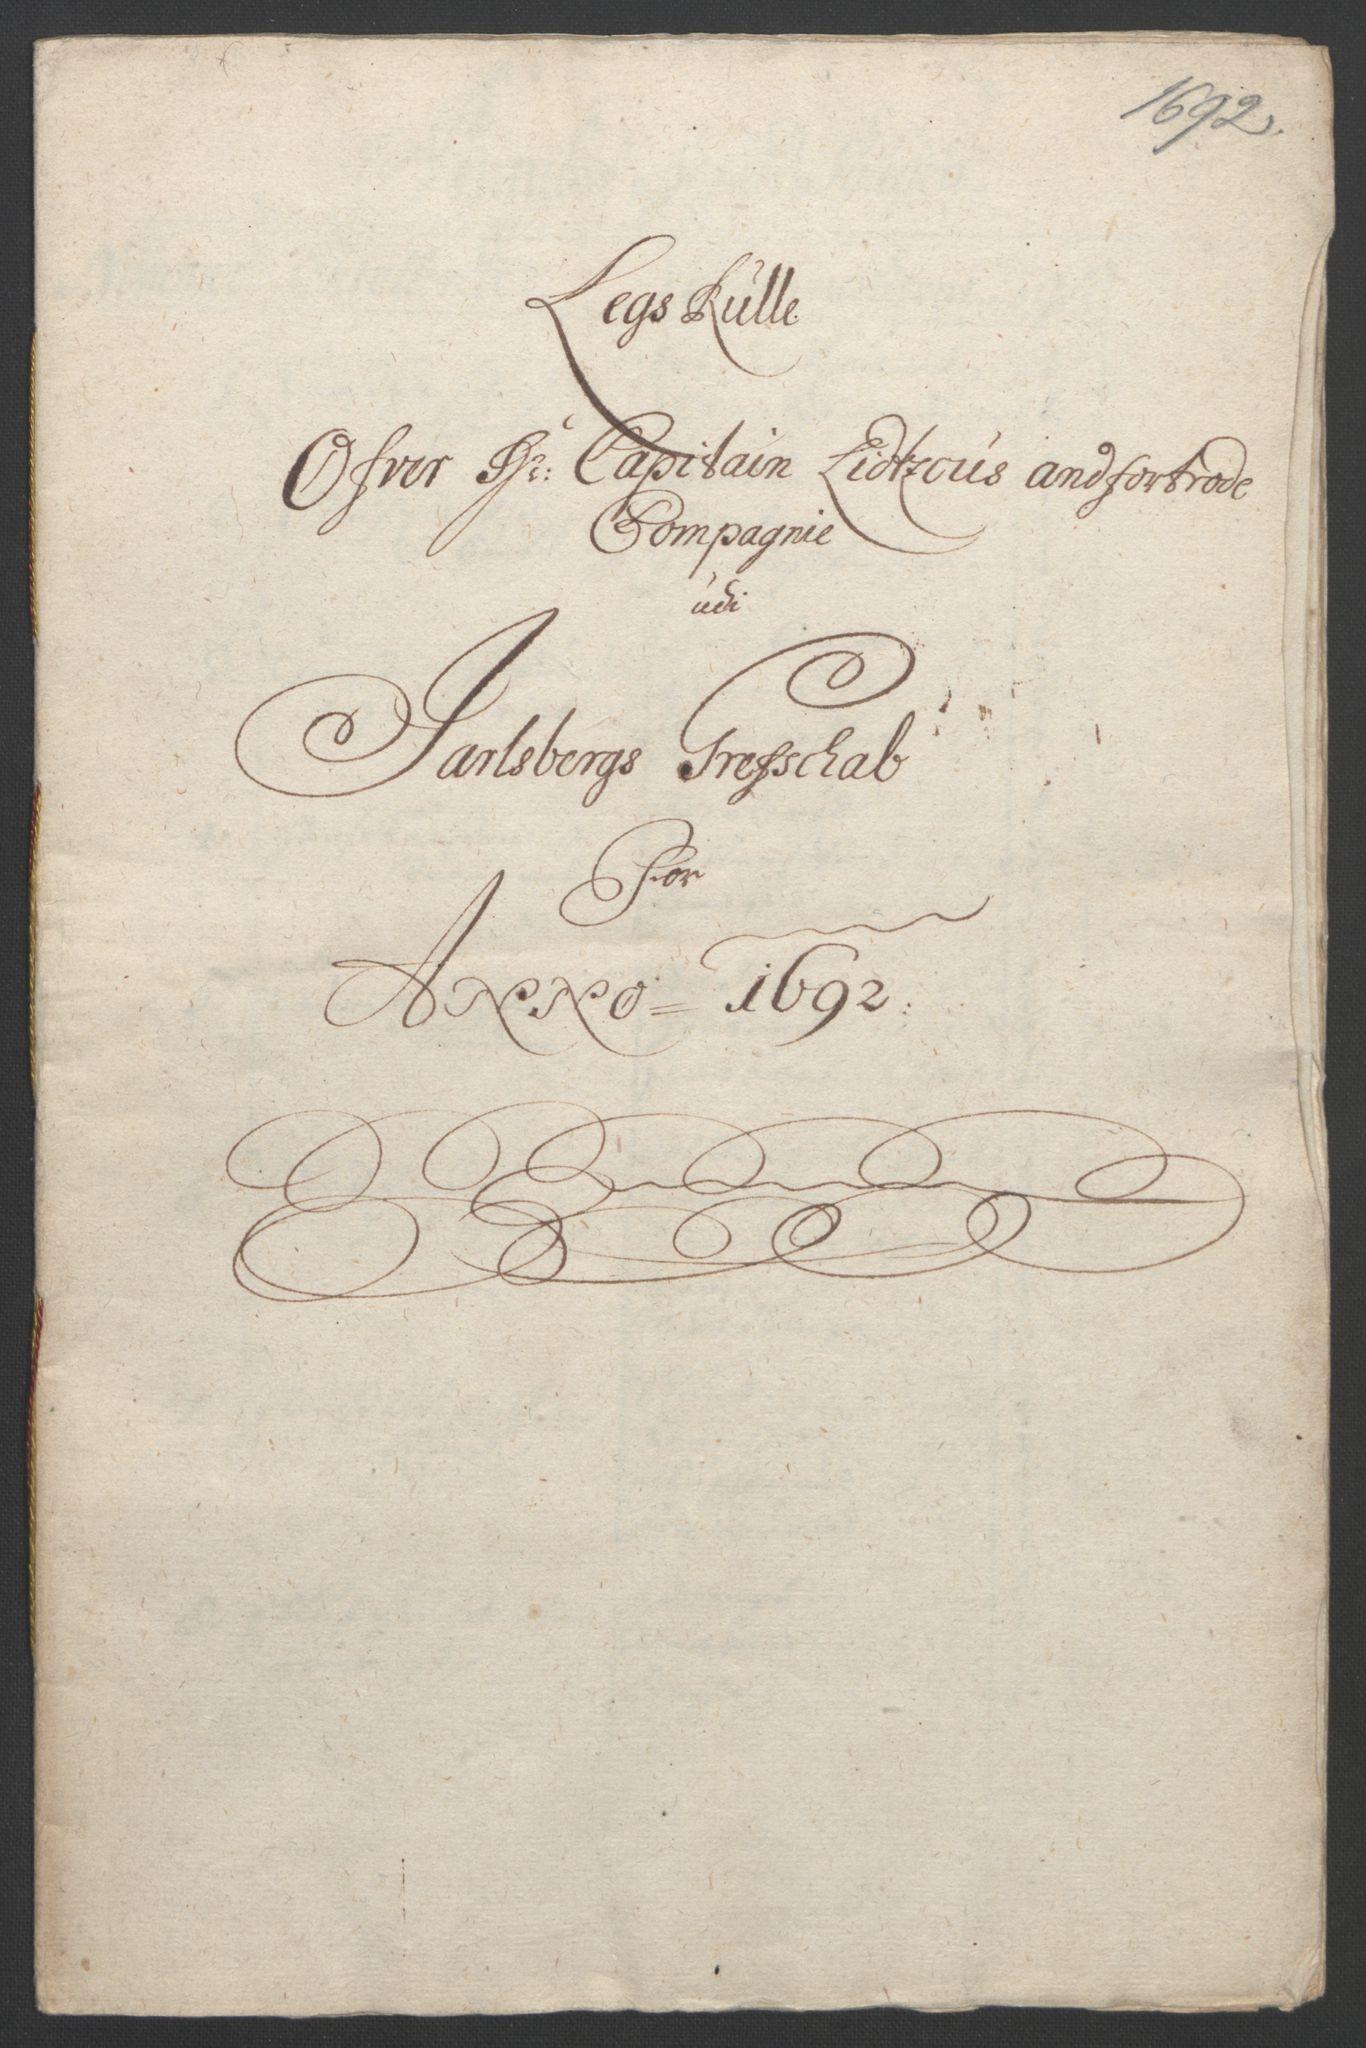 RA, Rentekammeret inntil 1814, Reviderte regnskaper, Fogderegnskap, R32/L1865: Fogderegnskap Jarlsberg grevskap, 1692, s. 218